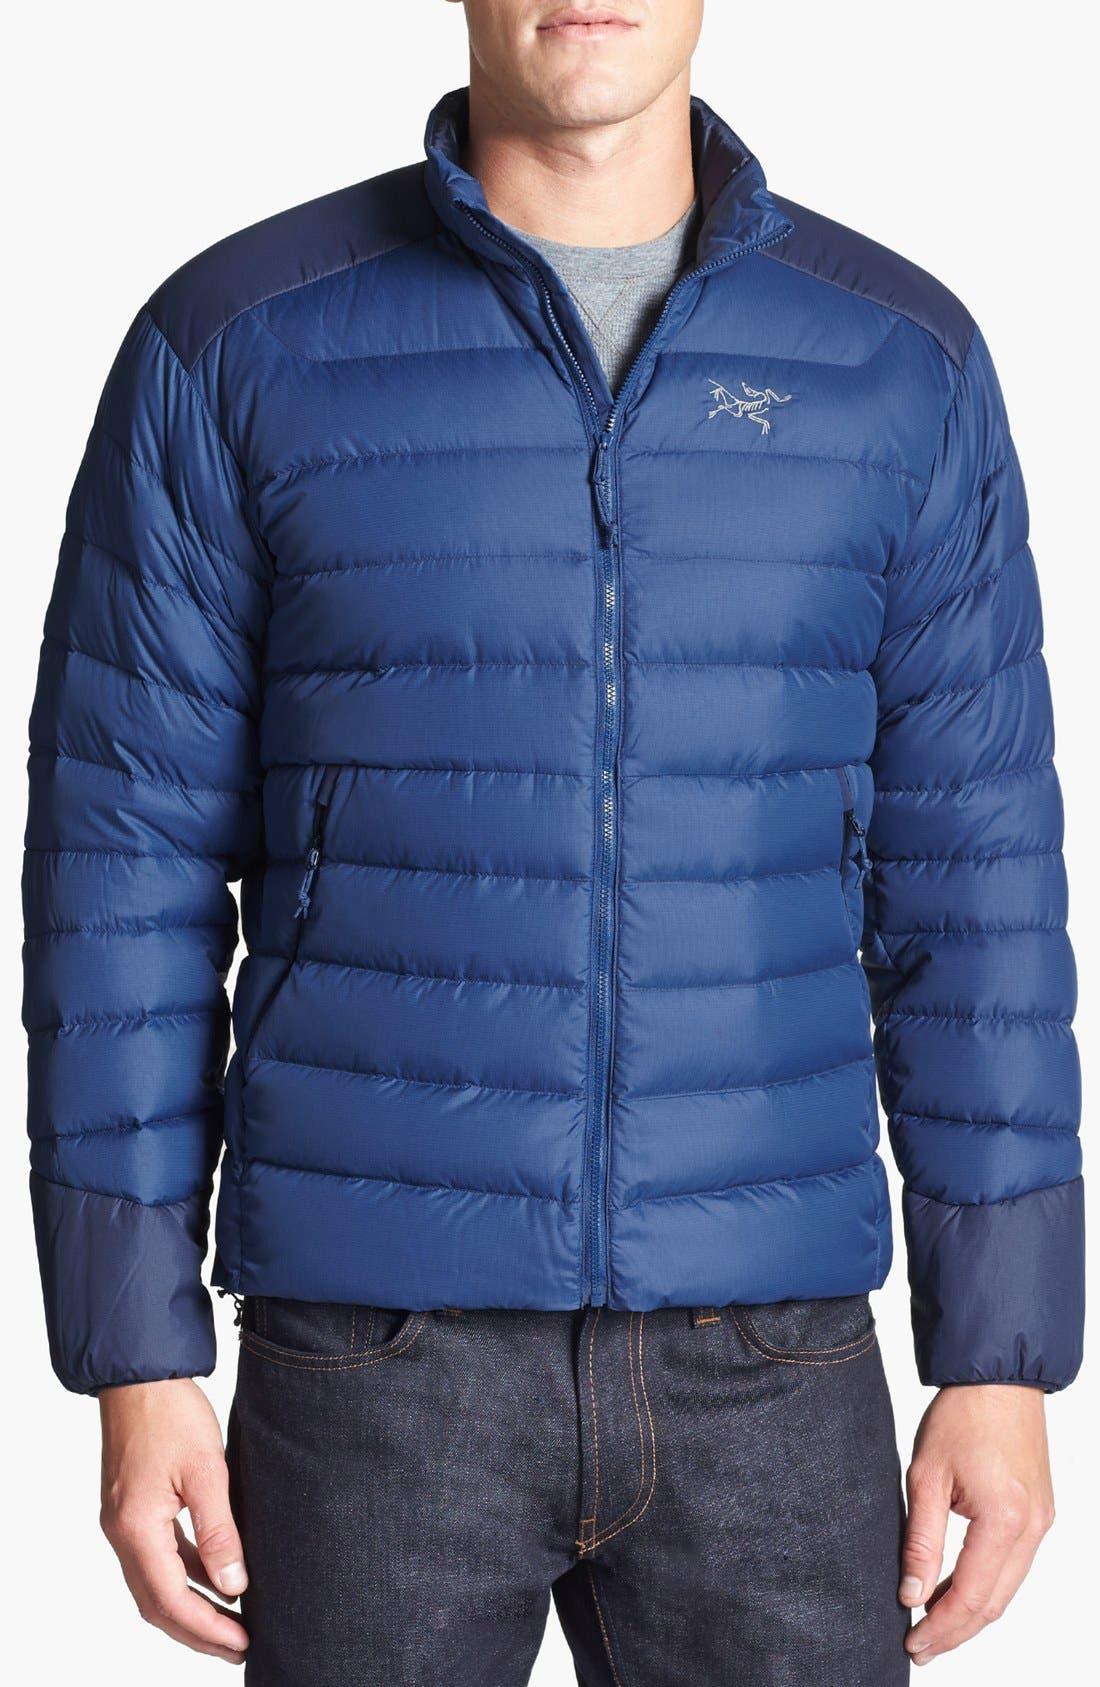 Main Image - Arc'teryx 'Thorium AR' Athletic Fit Down Jacket